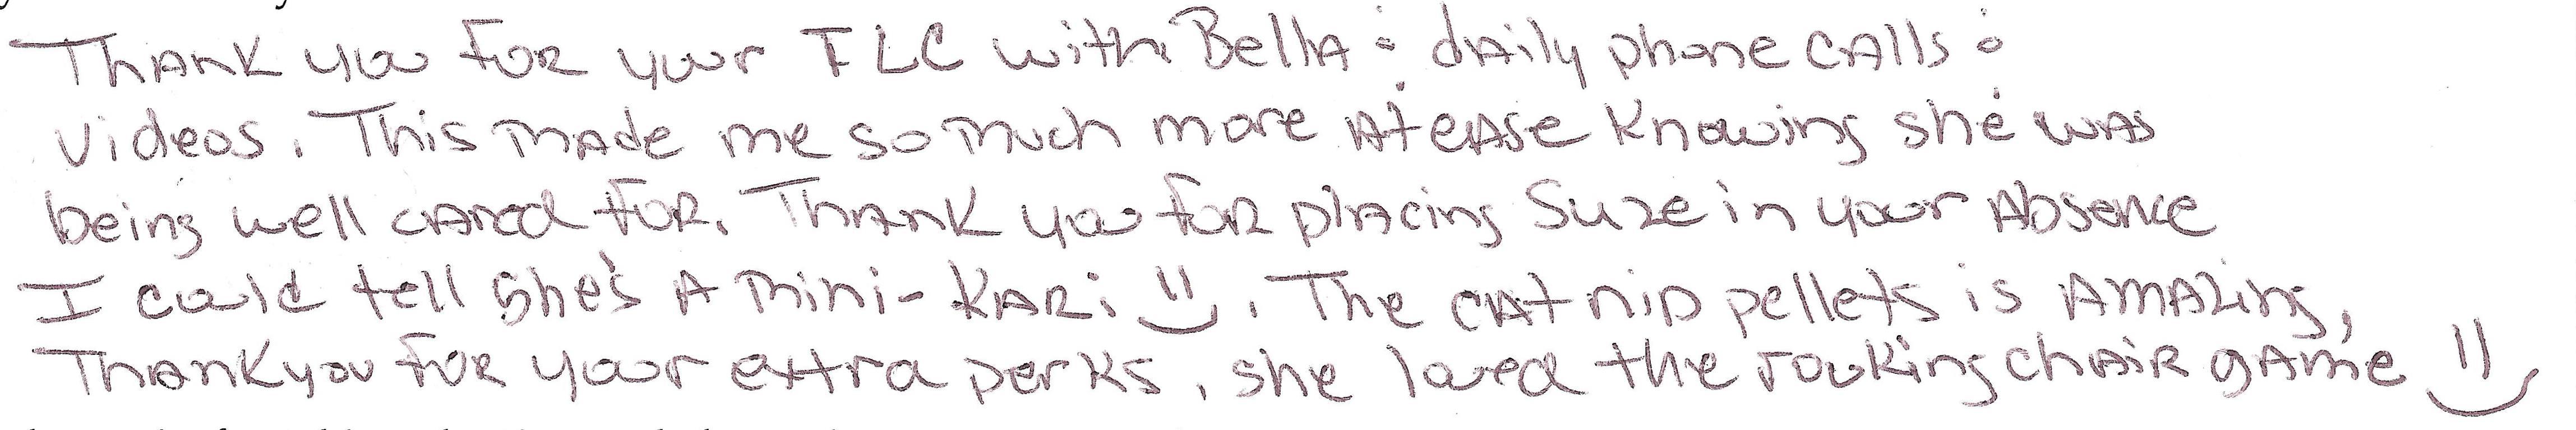 testimonial-bella-s-mama-q2